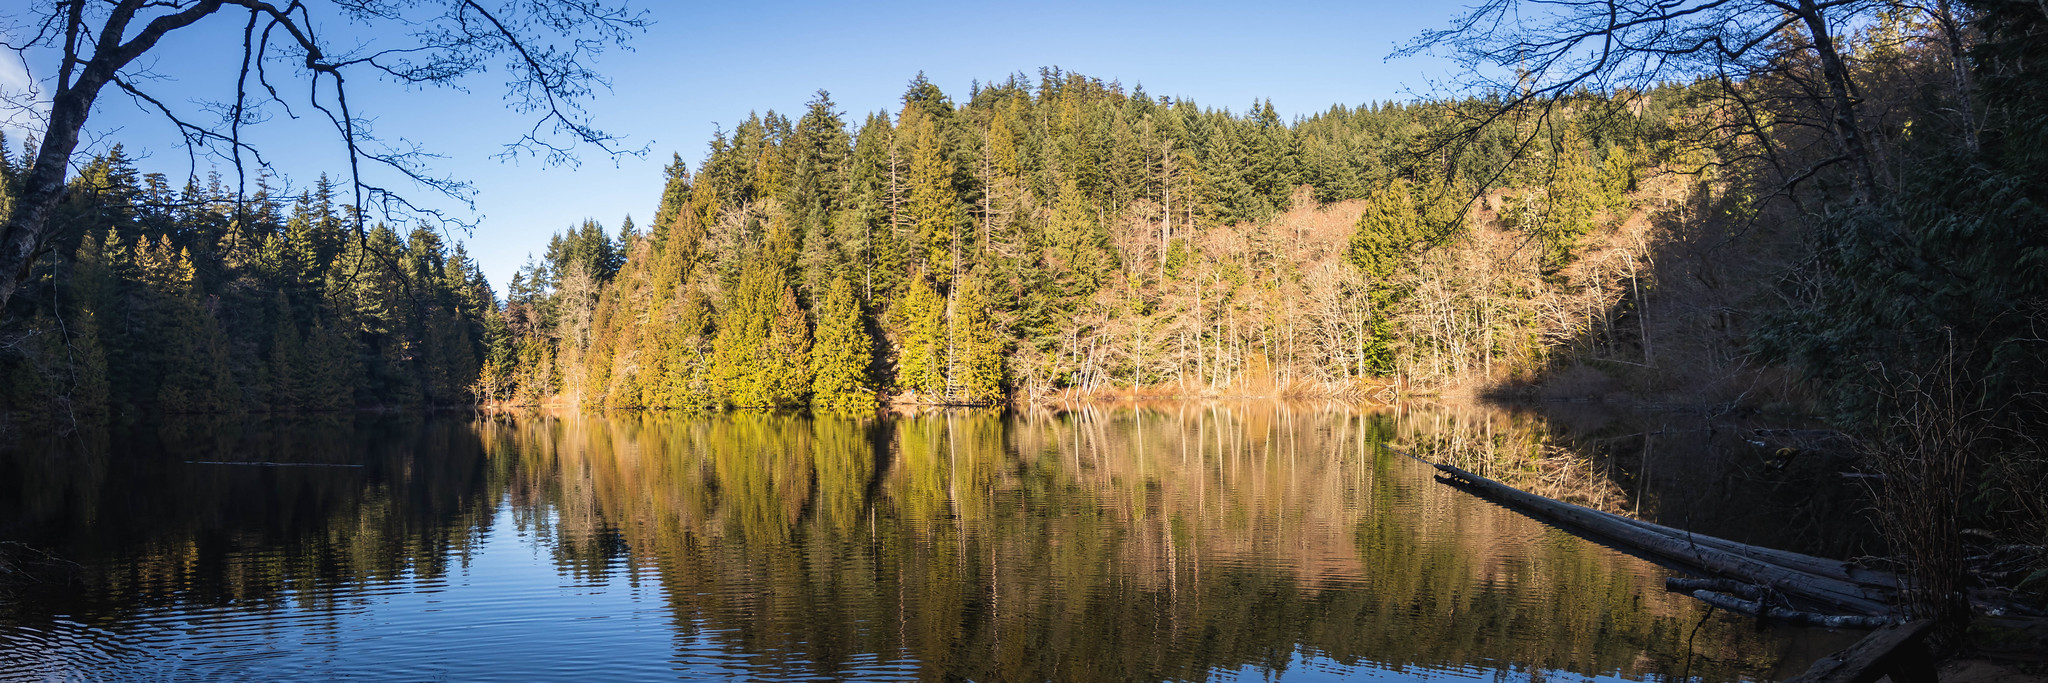 Fragrance Lake panoramic view